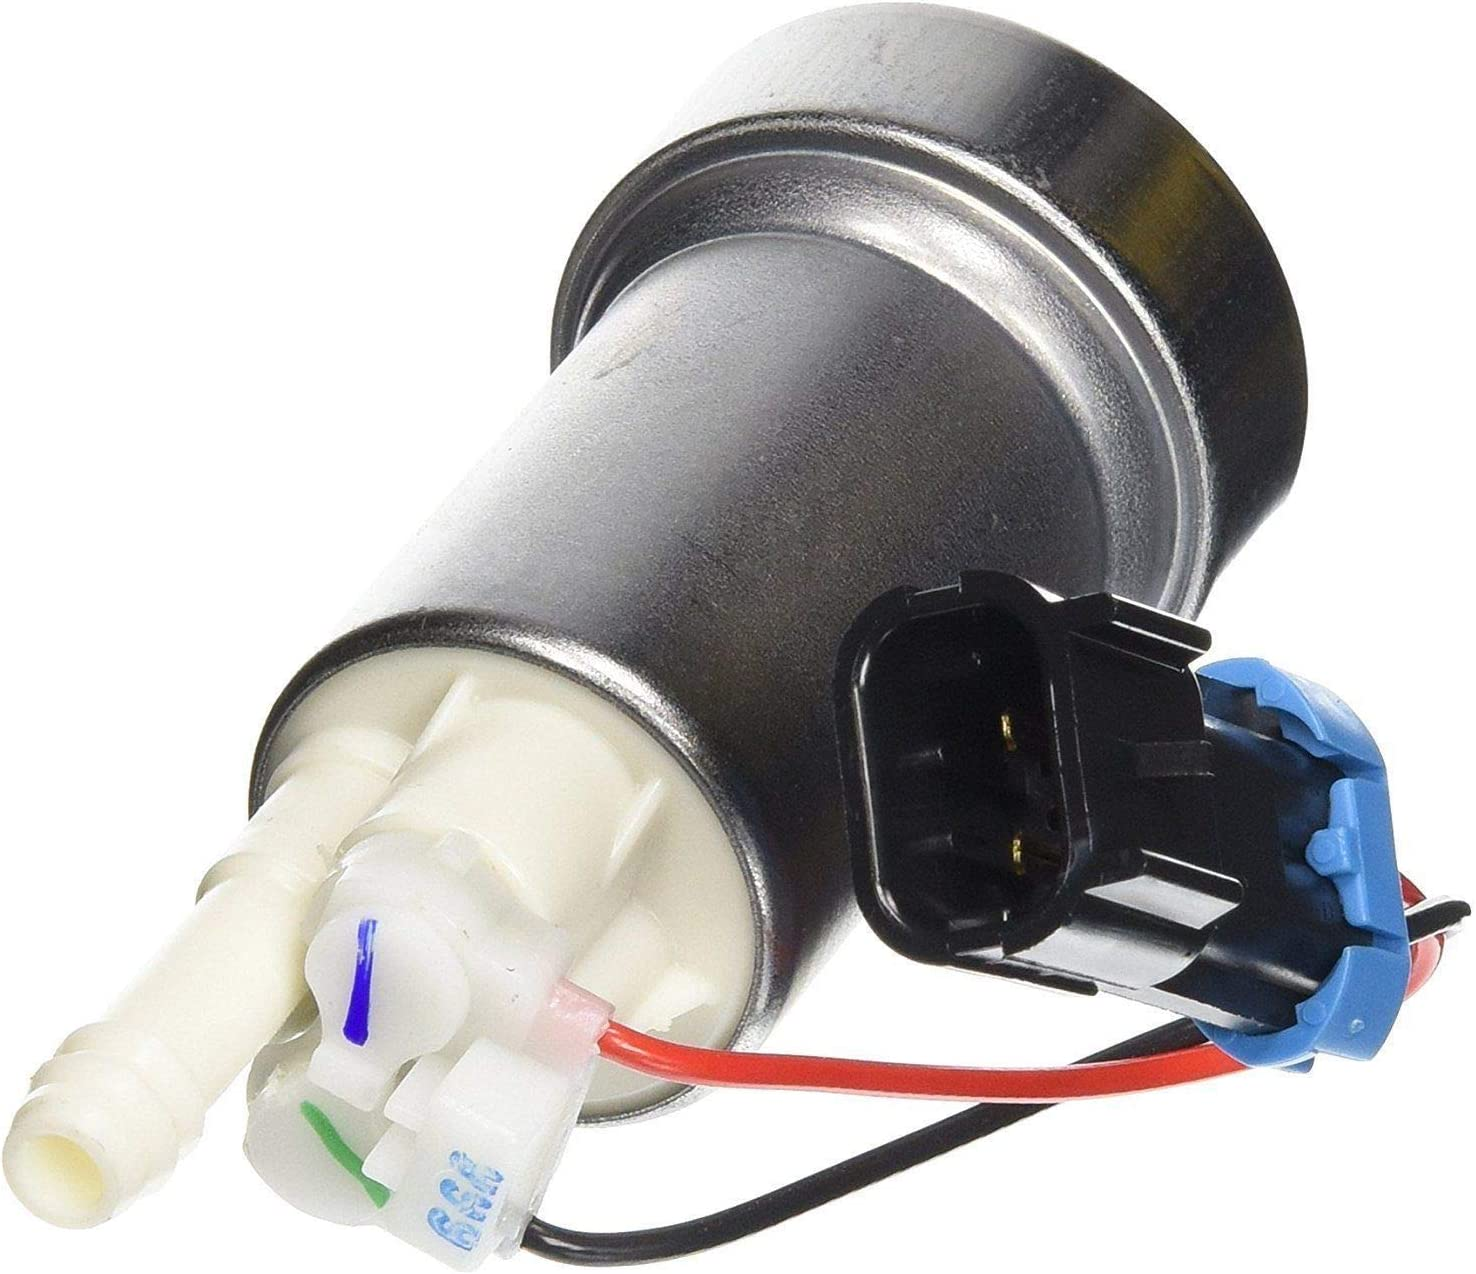 E85 New F90000267 High Performance Racing 450LPH Fuel Pump w//Install Kit